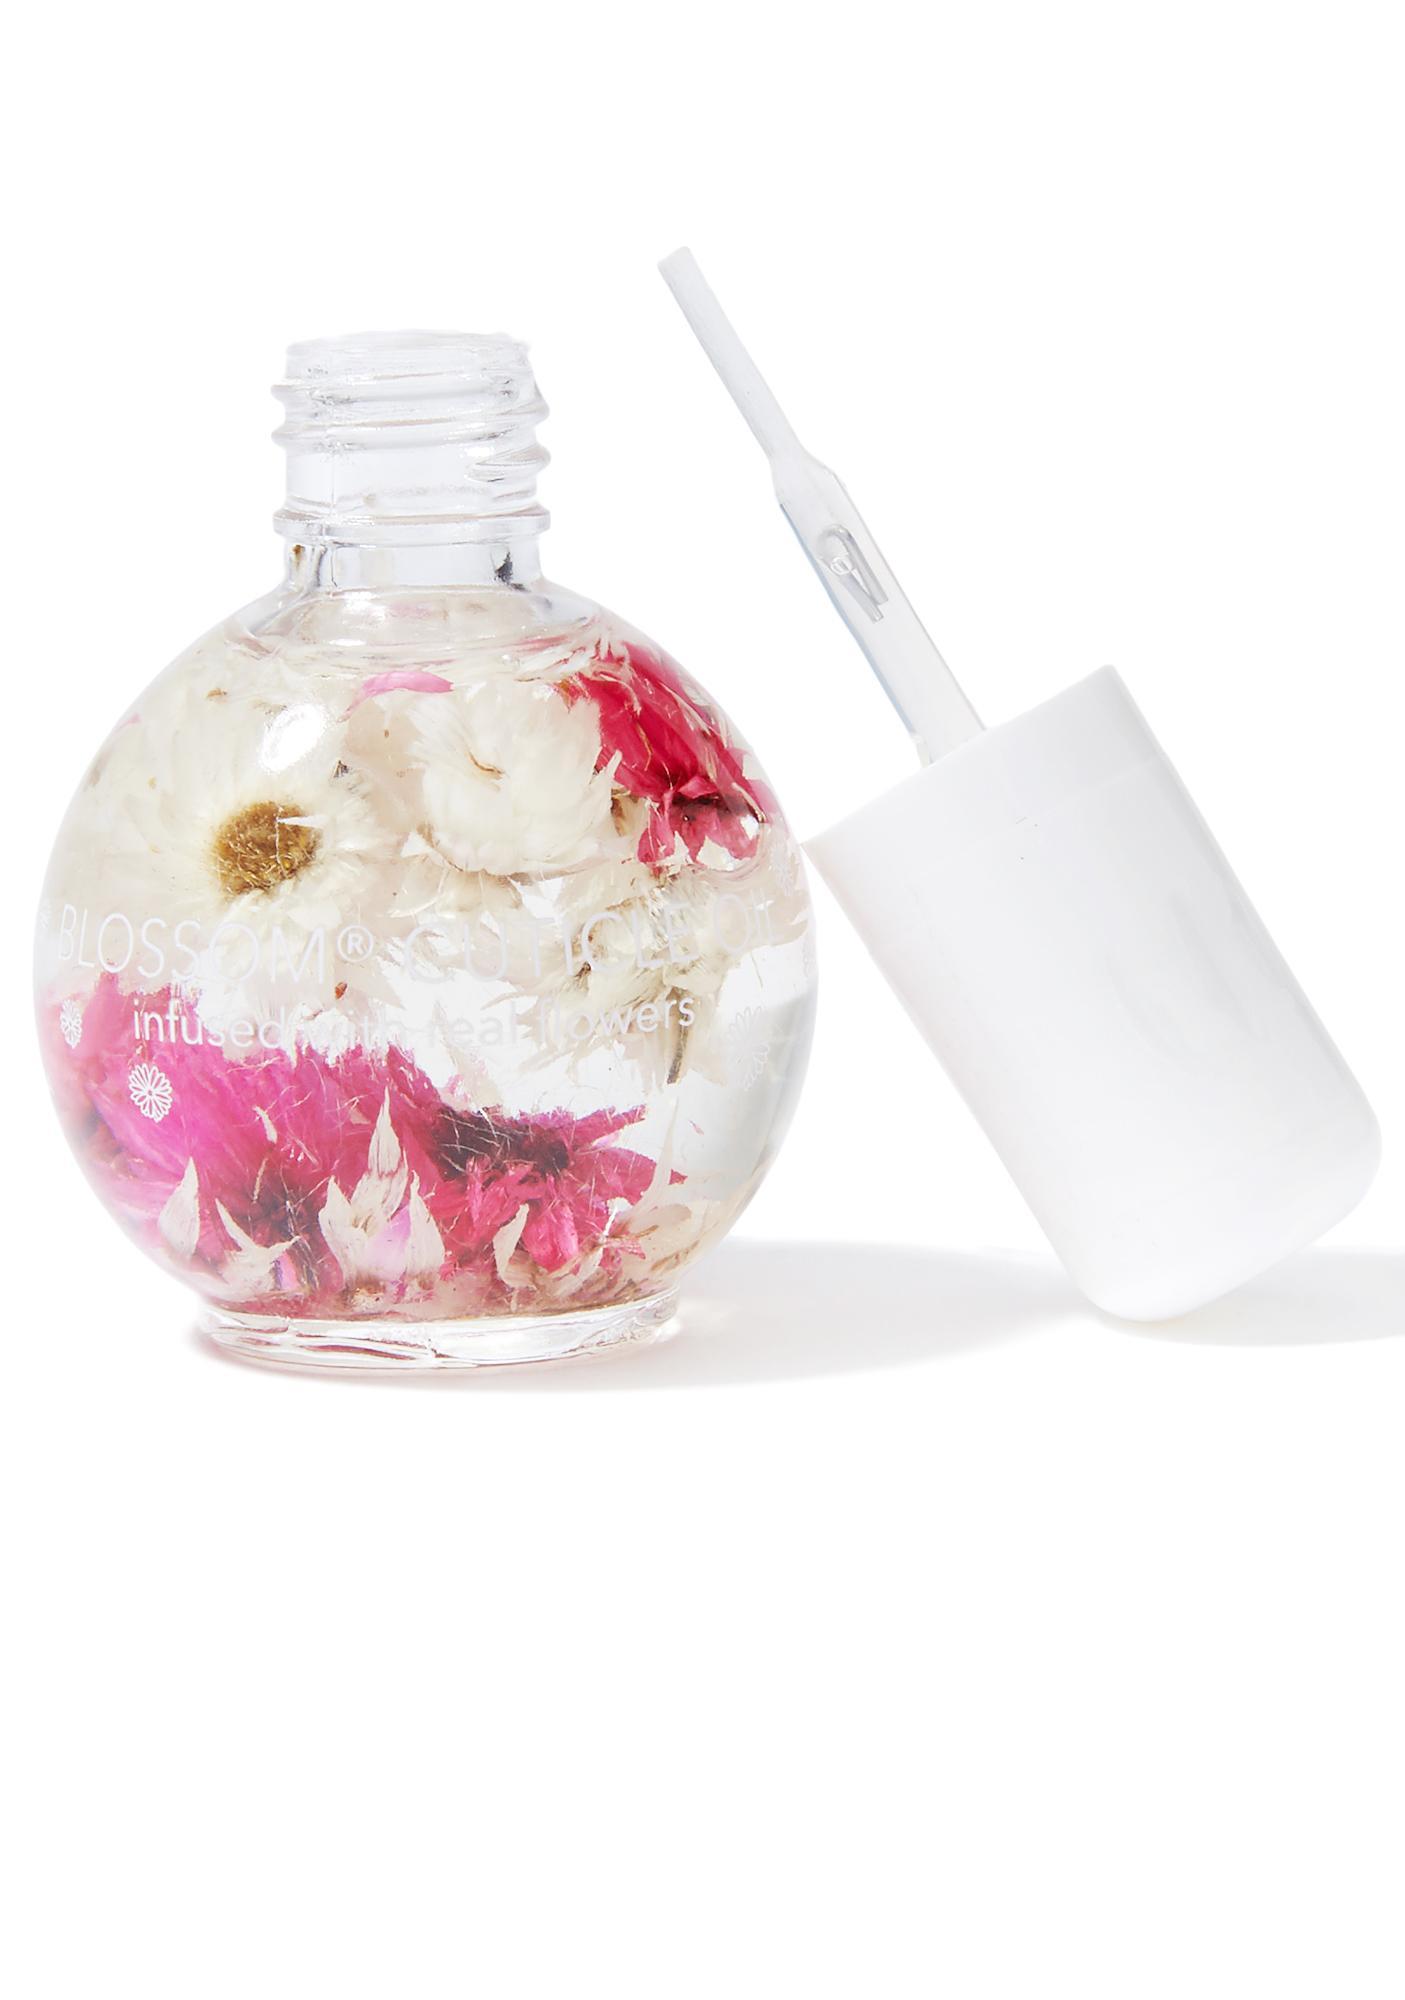 Blossom Rose Cuticle Oil